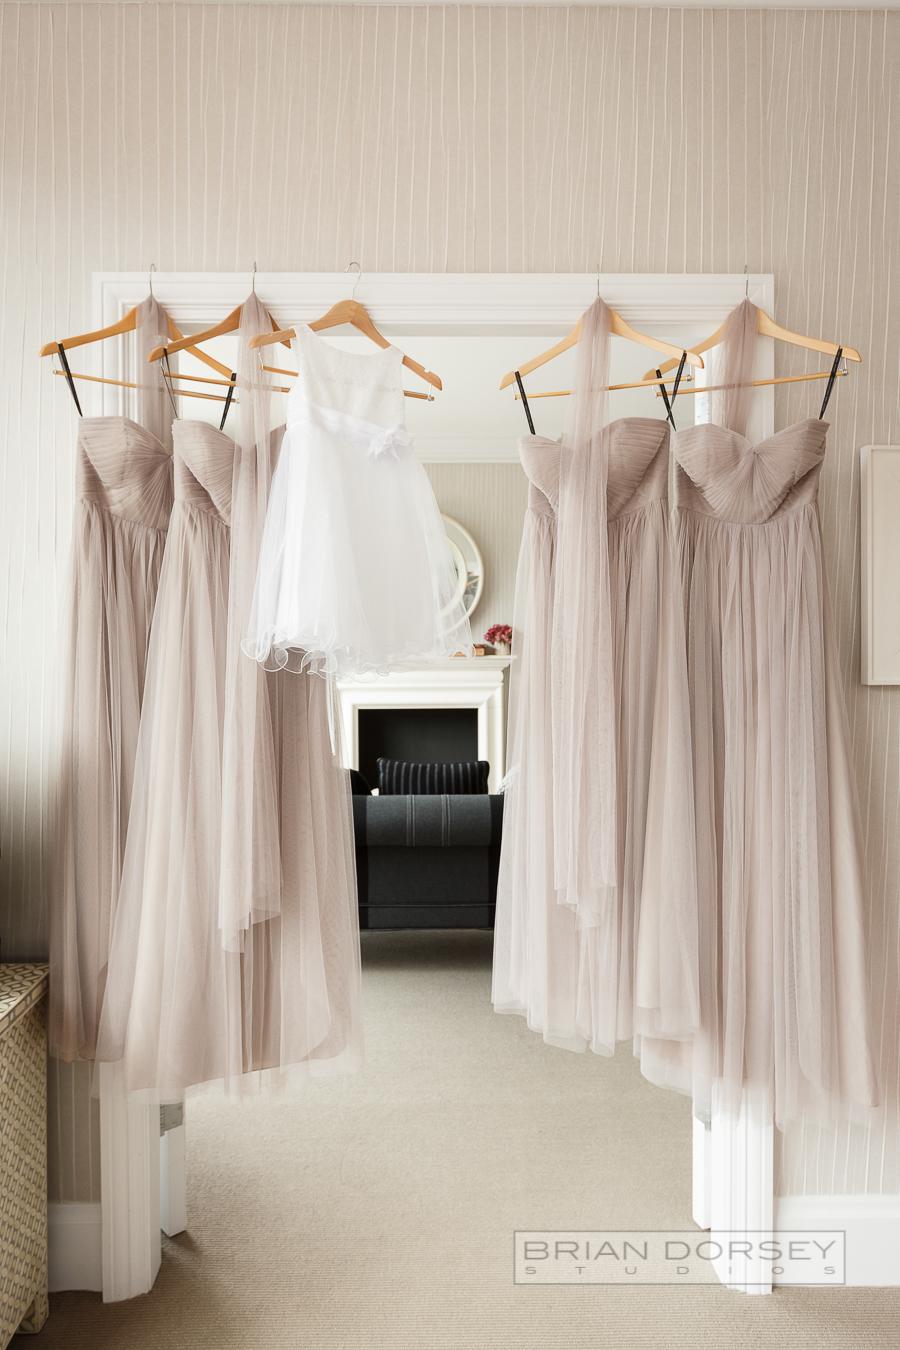 isola nomo soho hotel wedding brian dorsey studios ang weddings and events-4.jpg